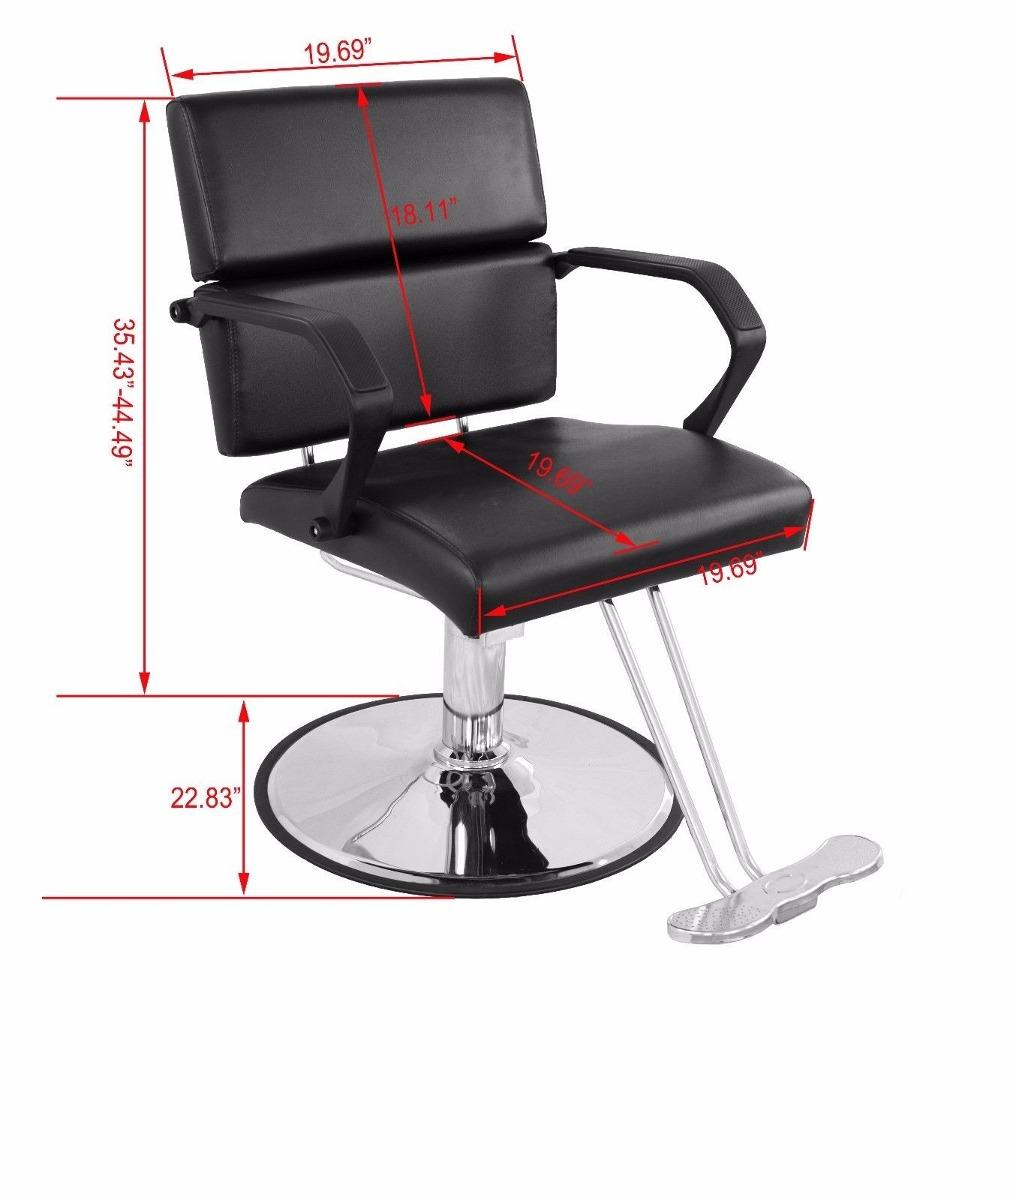 Silla hidraulica moderna para barberia peliquero o for Sillas para barberia